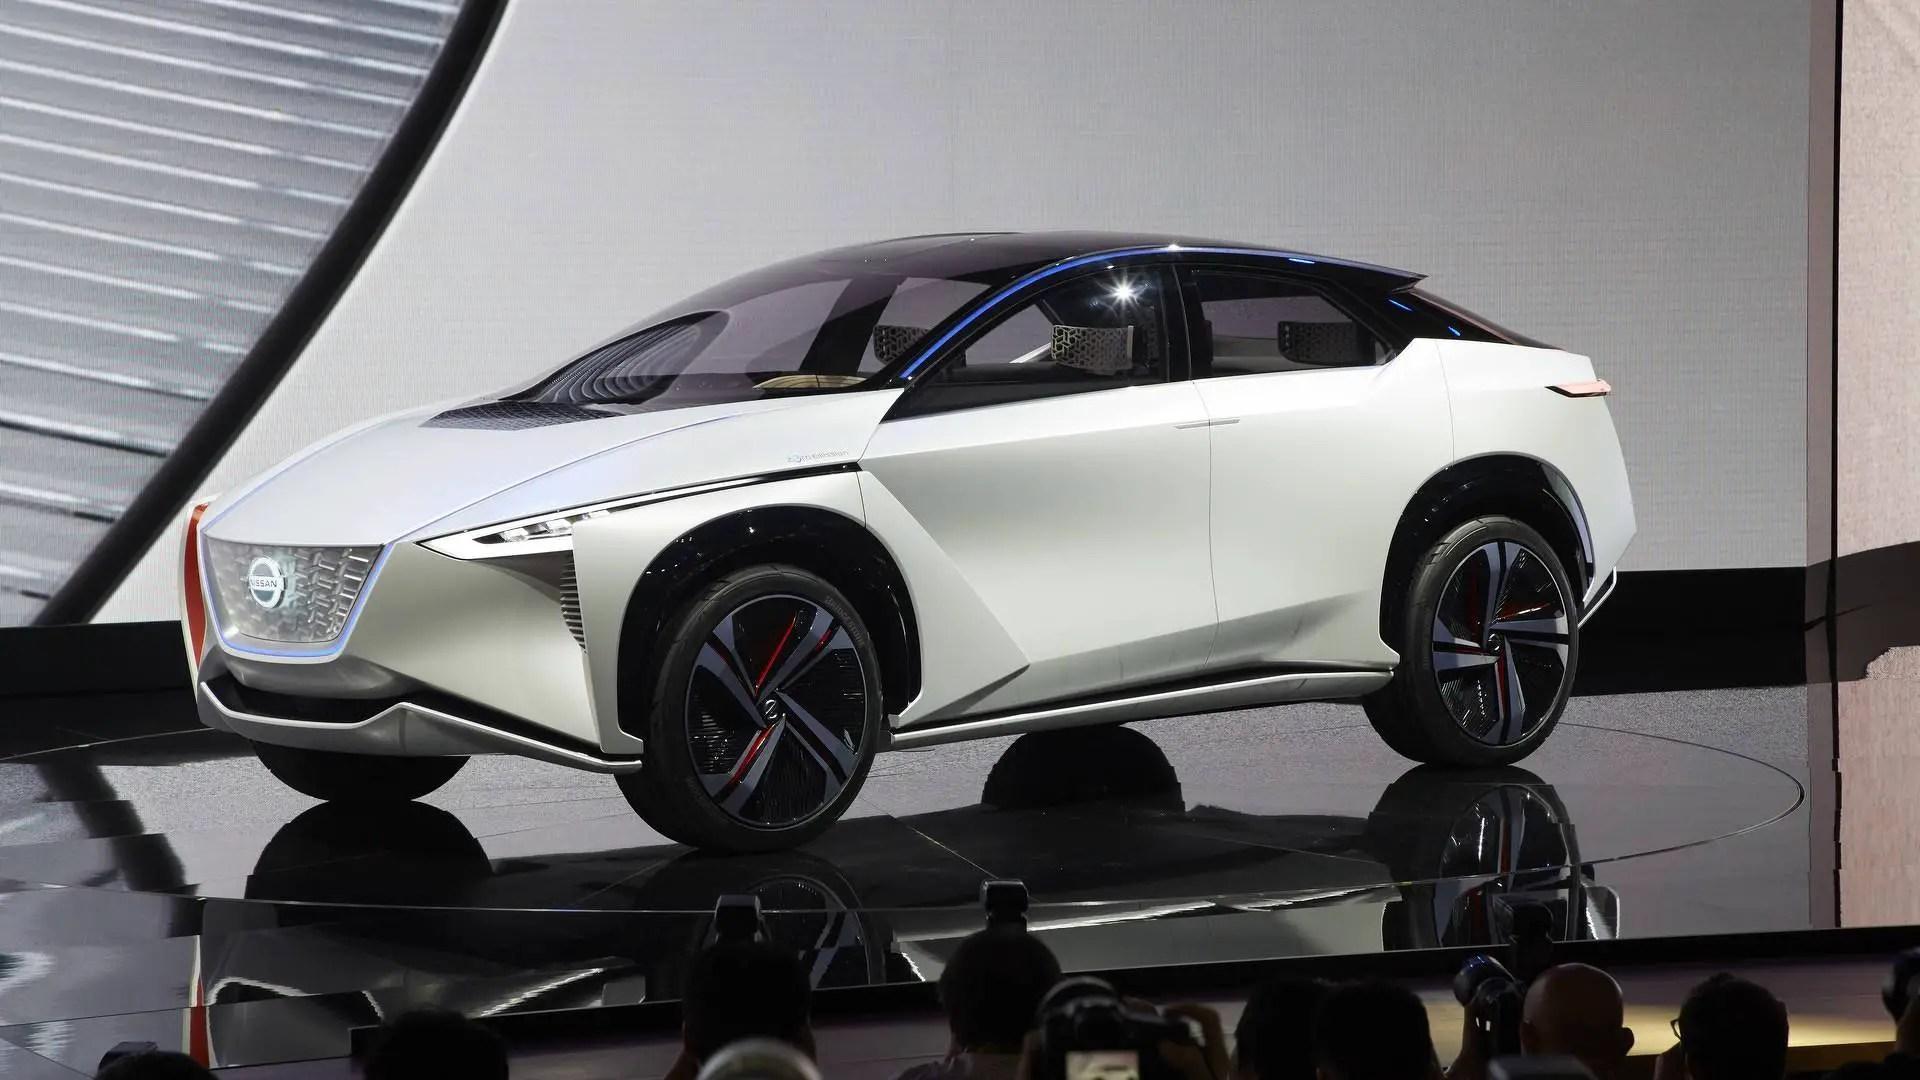 2020 Nissan Qashqai Gasoline DIG-T Engine